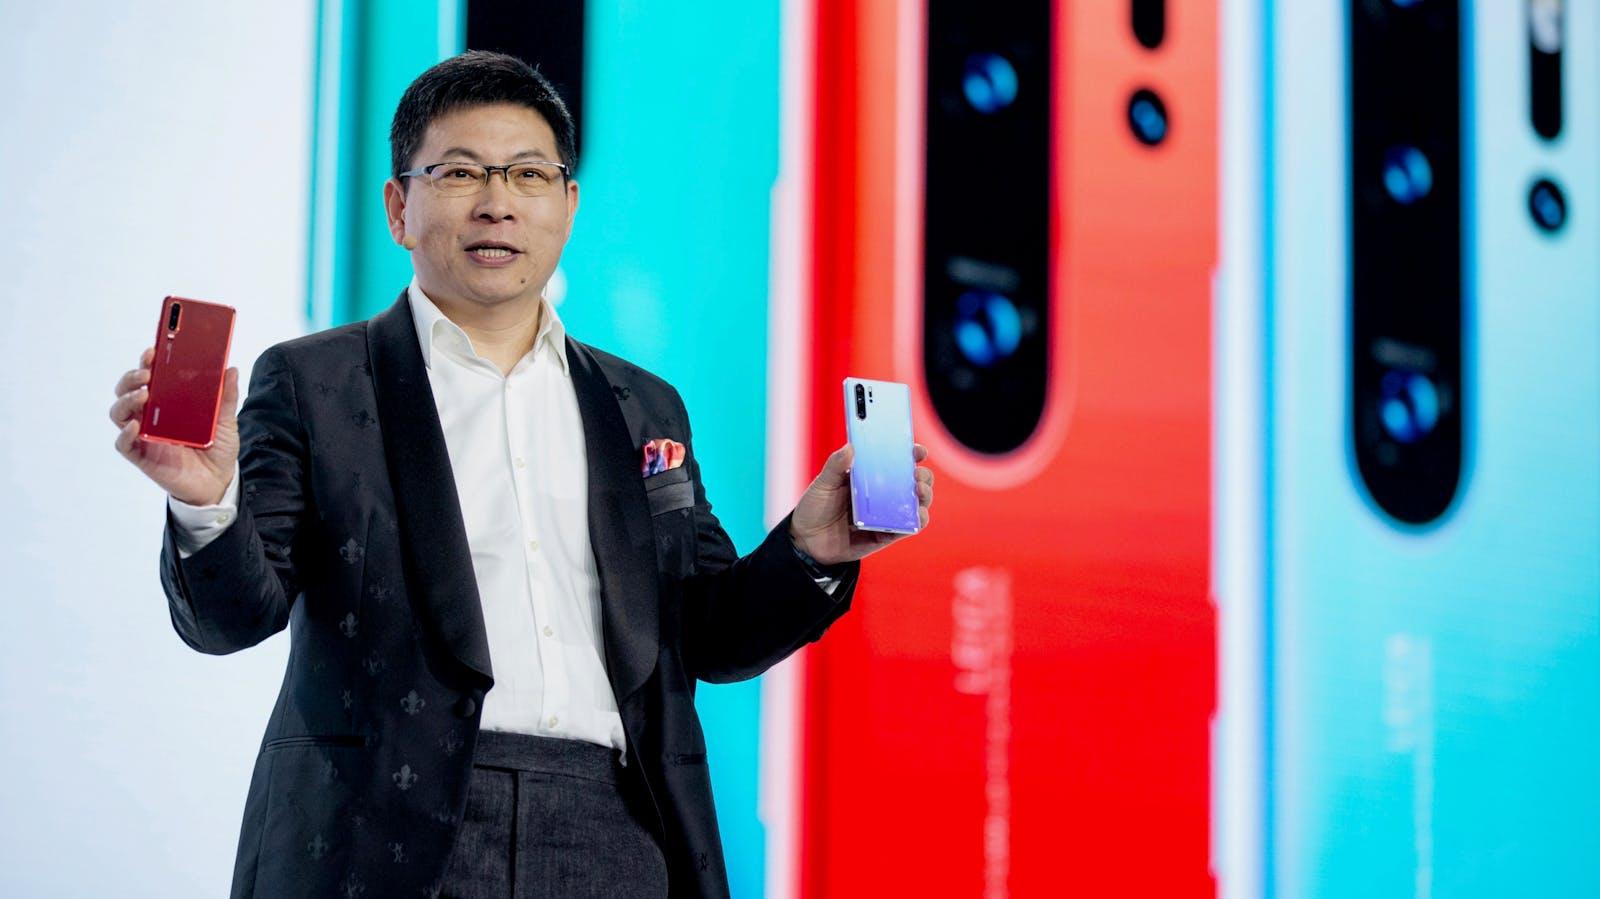 Huawei's consumer electronics chief Richard Yu. Photo by Bloomberg